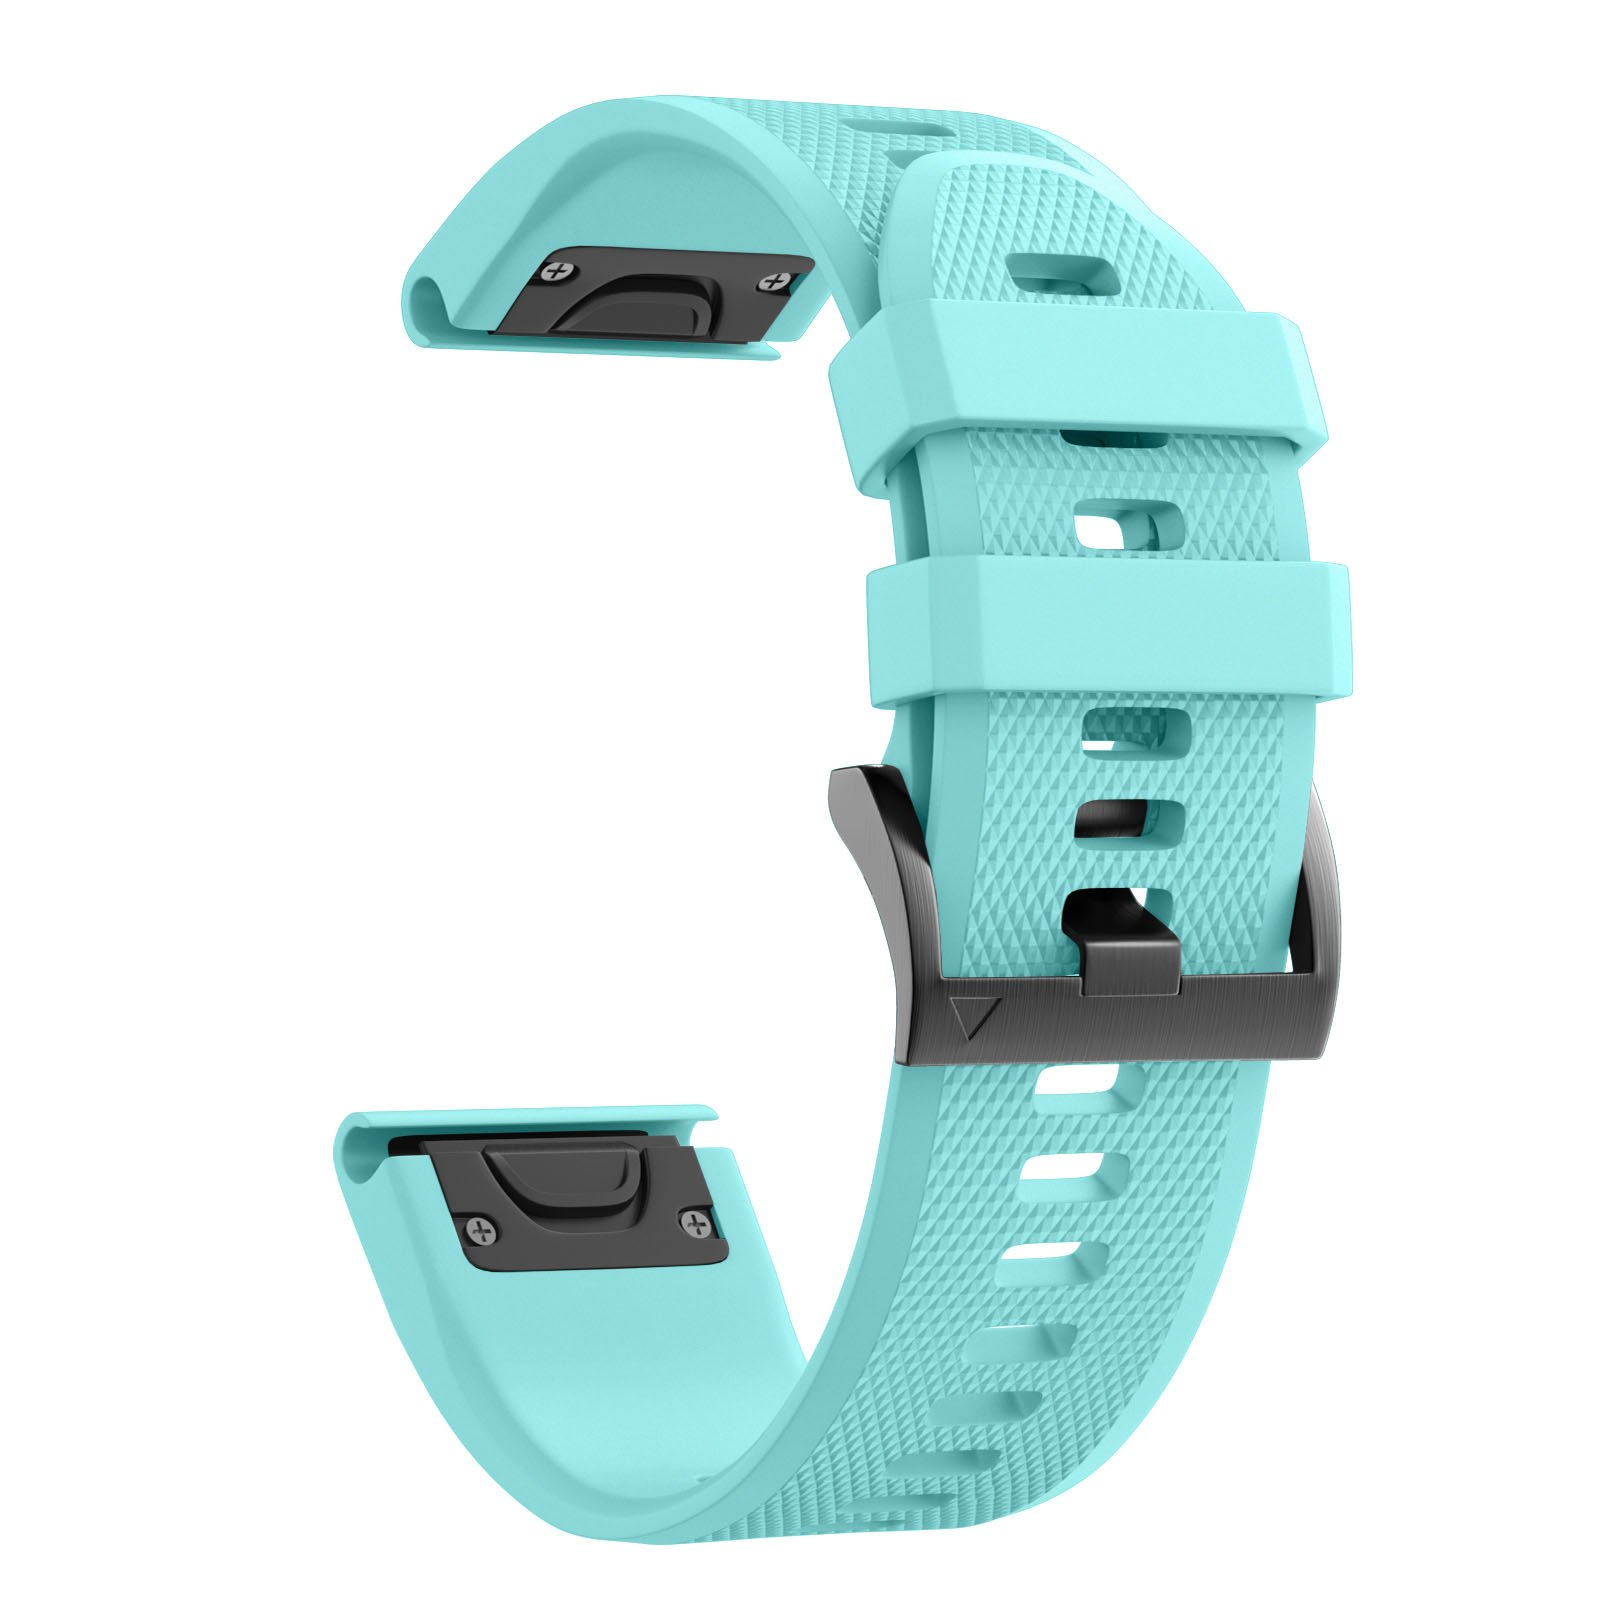 ANCOOL Compatible Garmin Fenix 5 Band Easy Fit 22mm Width Soft Silicone Watch Strap Compatible Garmin Fenix 5/Fenix 5 Plus/Forerunner 935/Approach S60/Quatix 5 - Mint